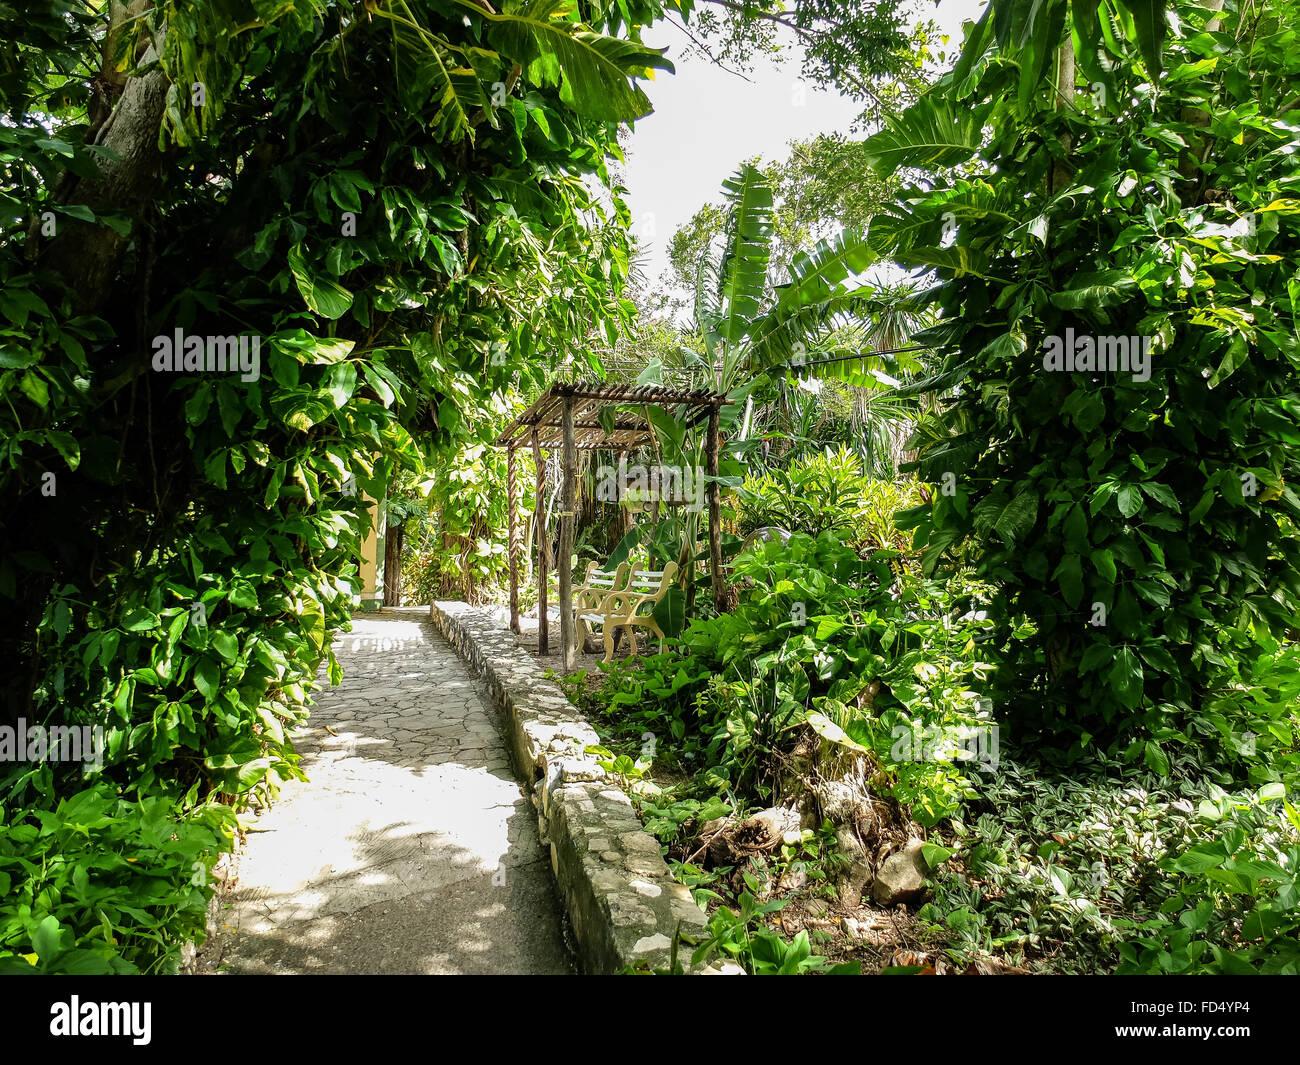 Sentier de jardin luxuriant Photo Stock